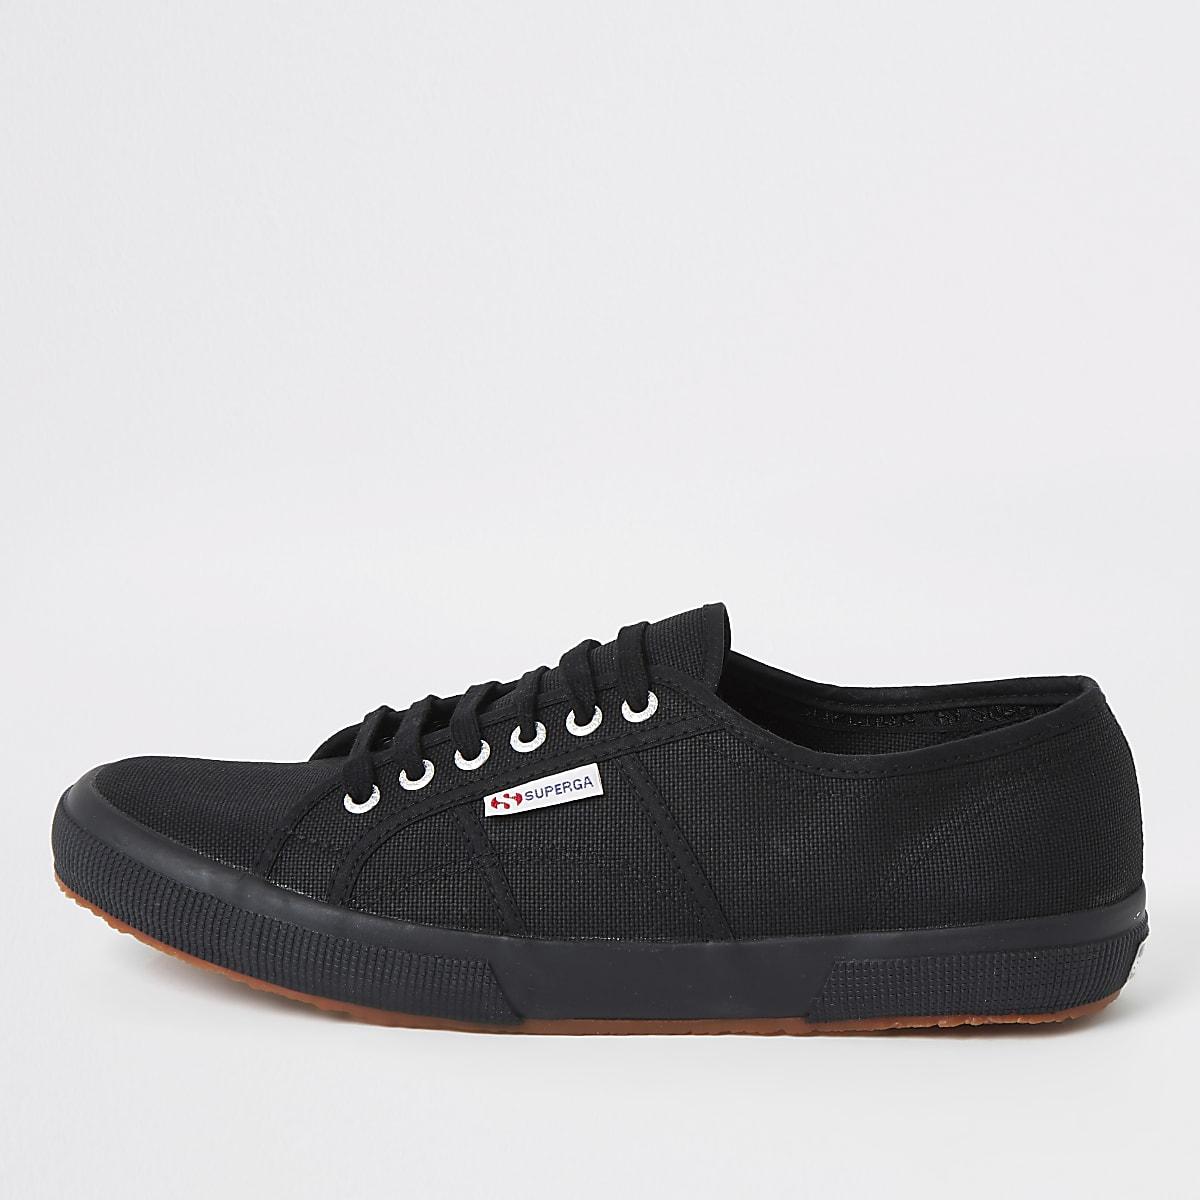 Superga black classic gum sole runner sneaker